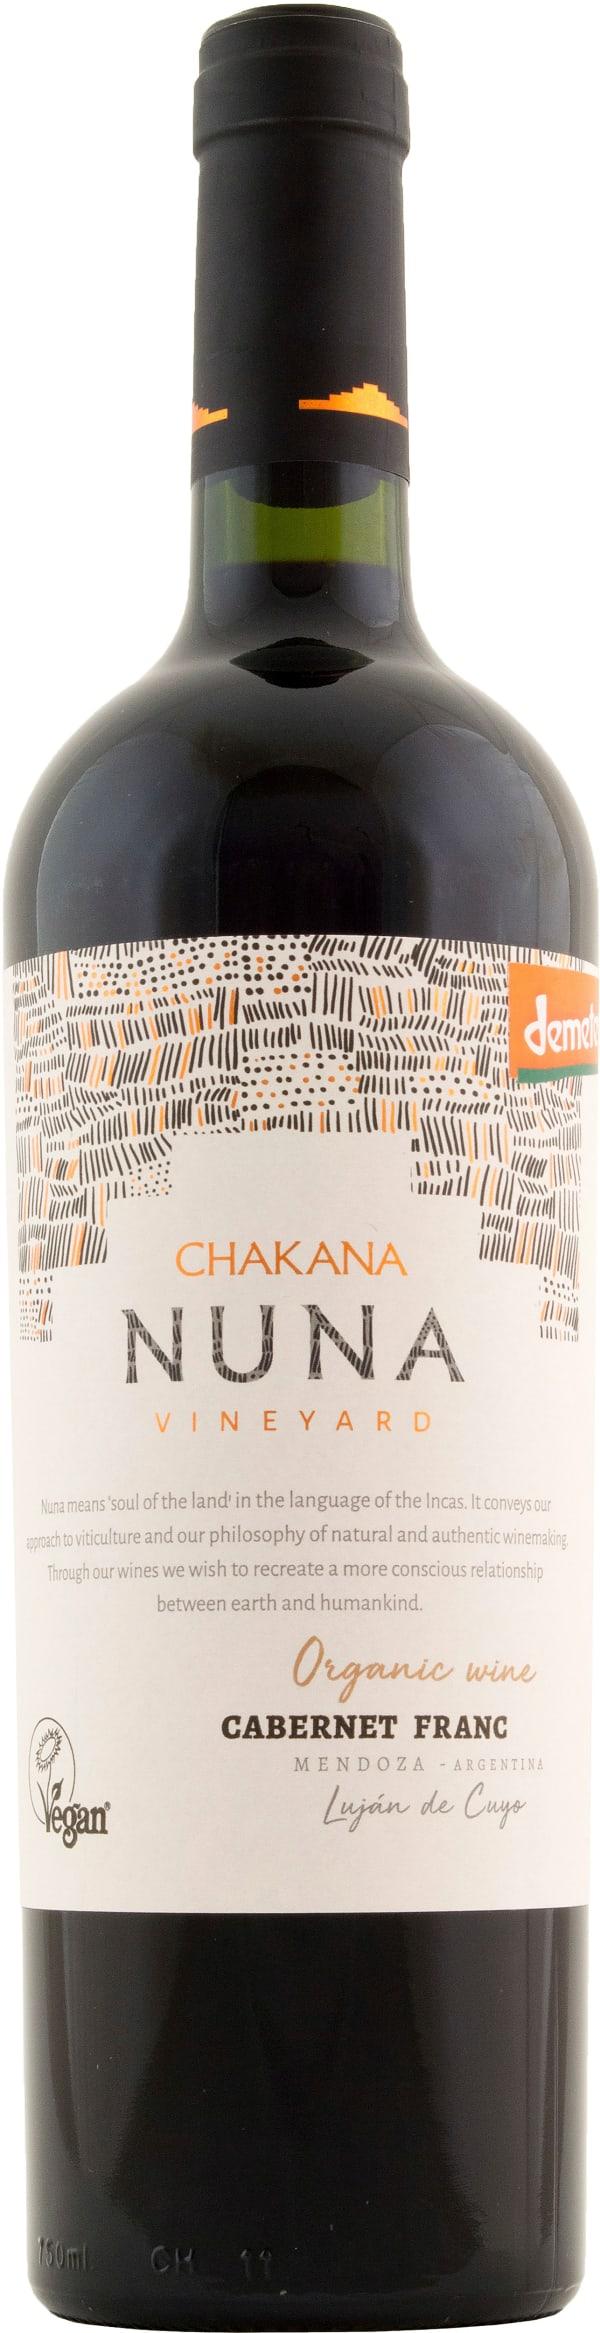 Chakana Nuna Vineyard Cabernet Franc 2018